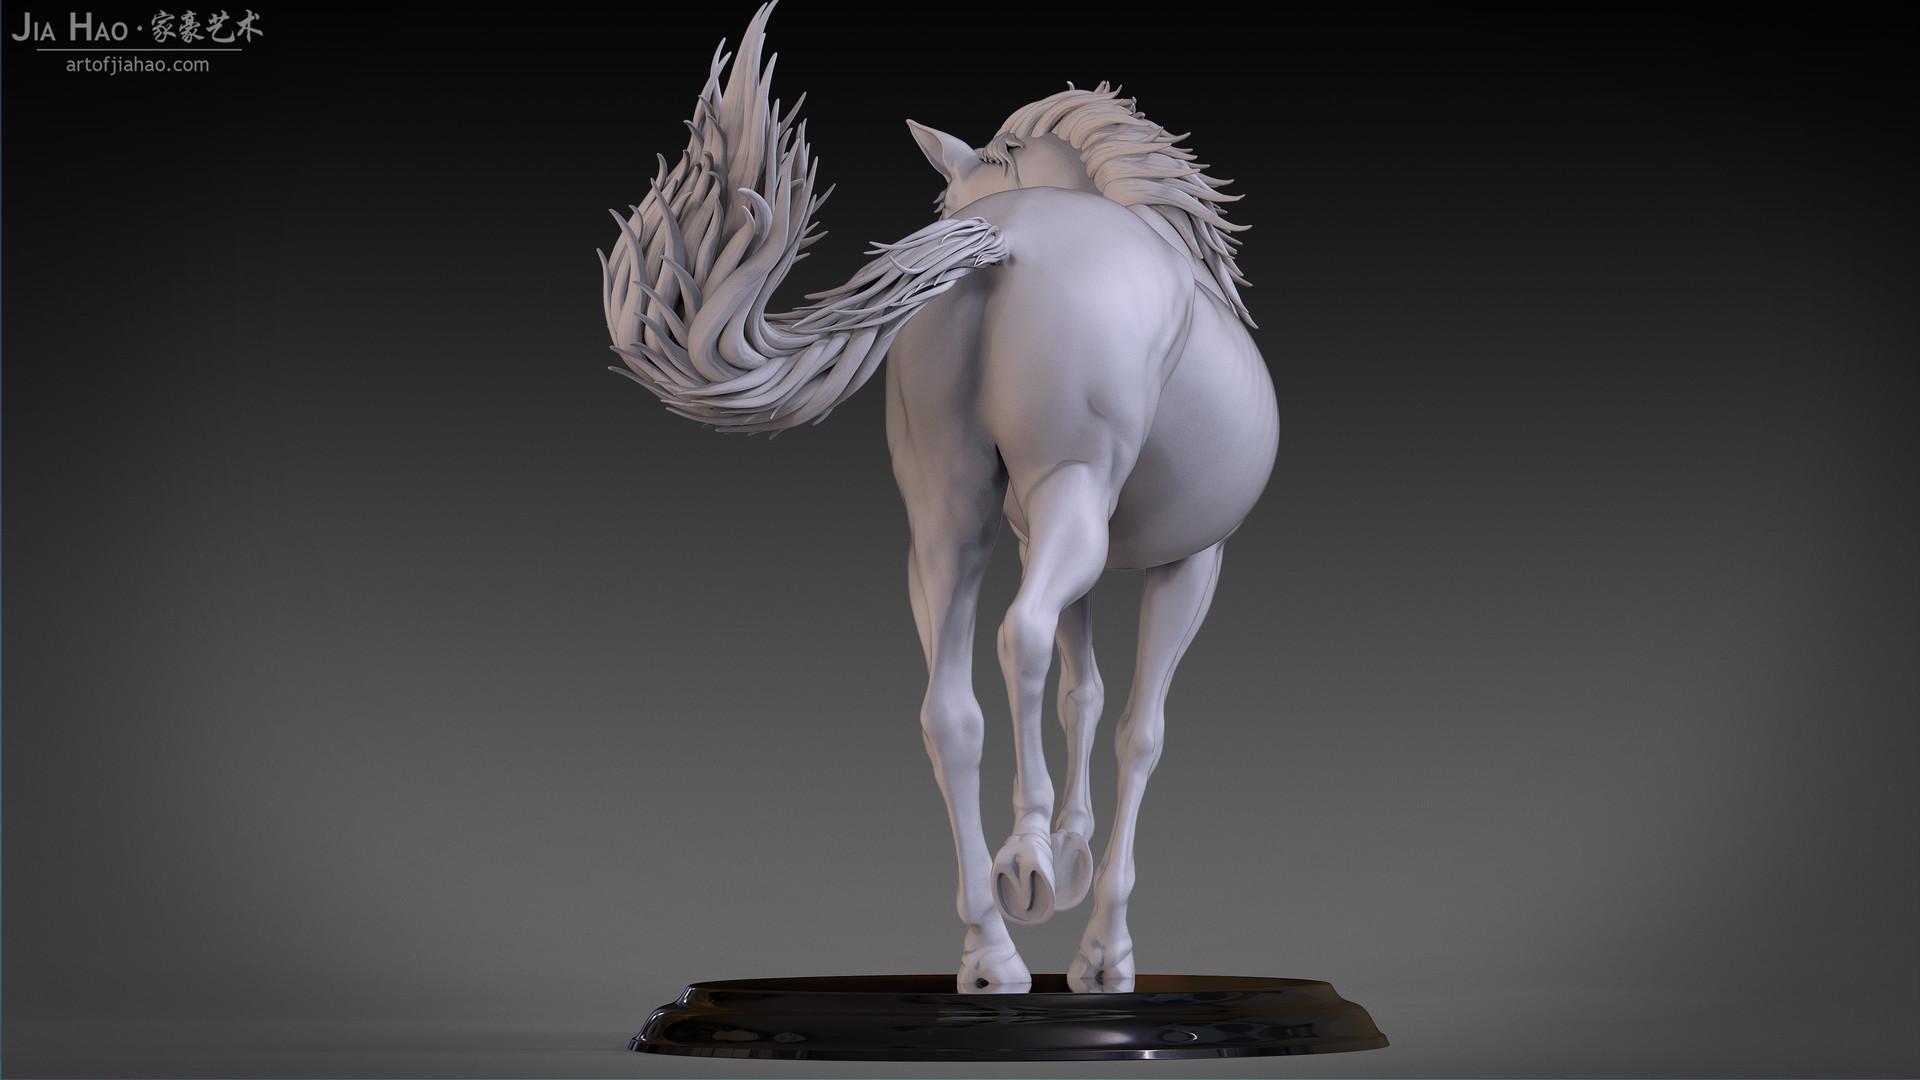 Jia hao horse sculpture comp clay 05